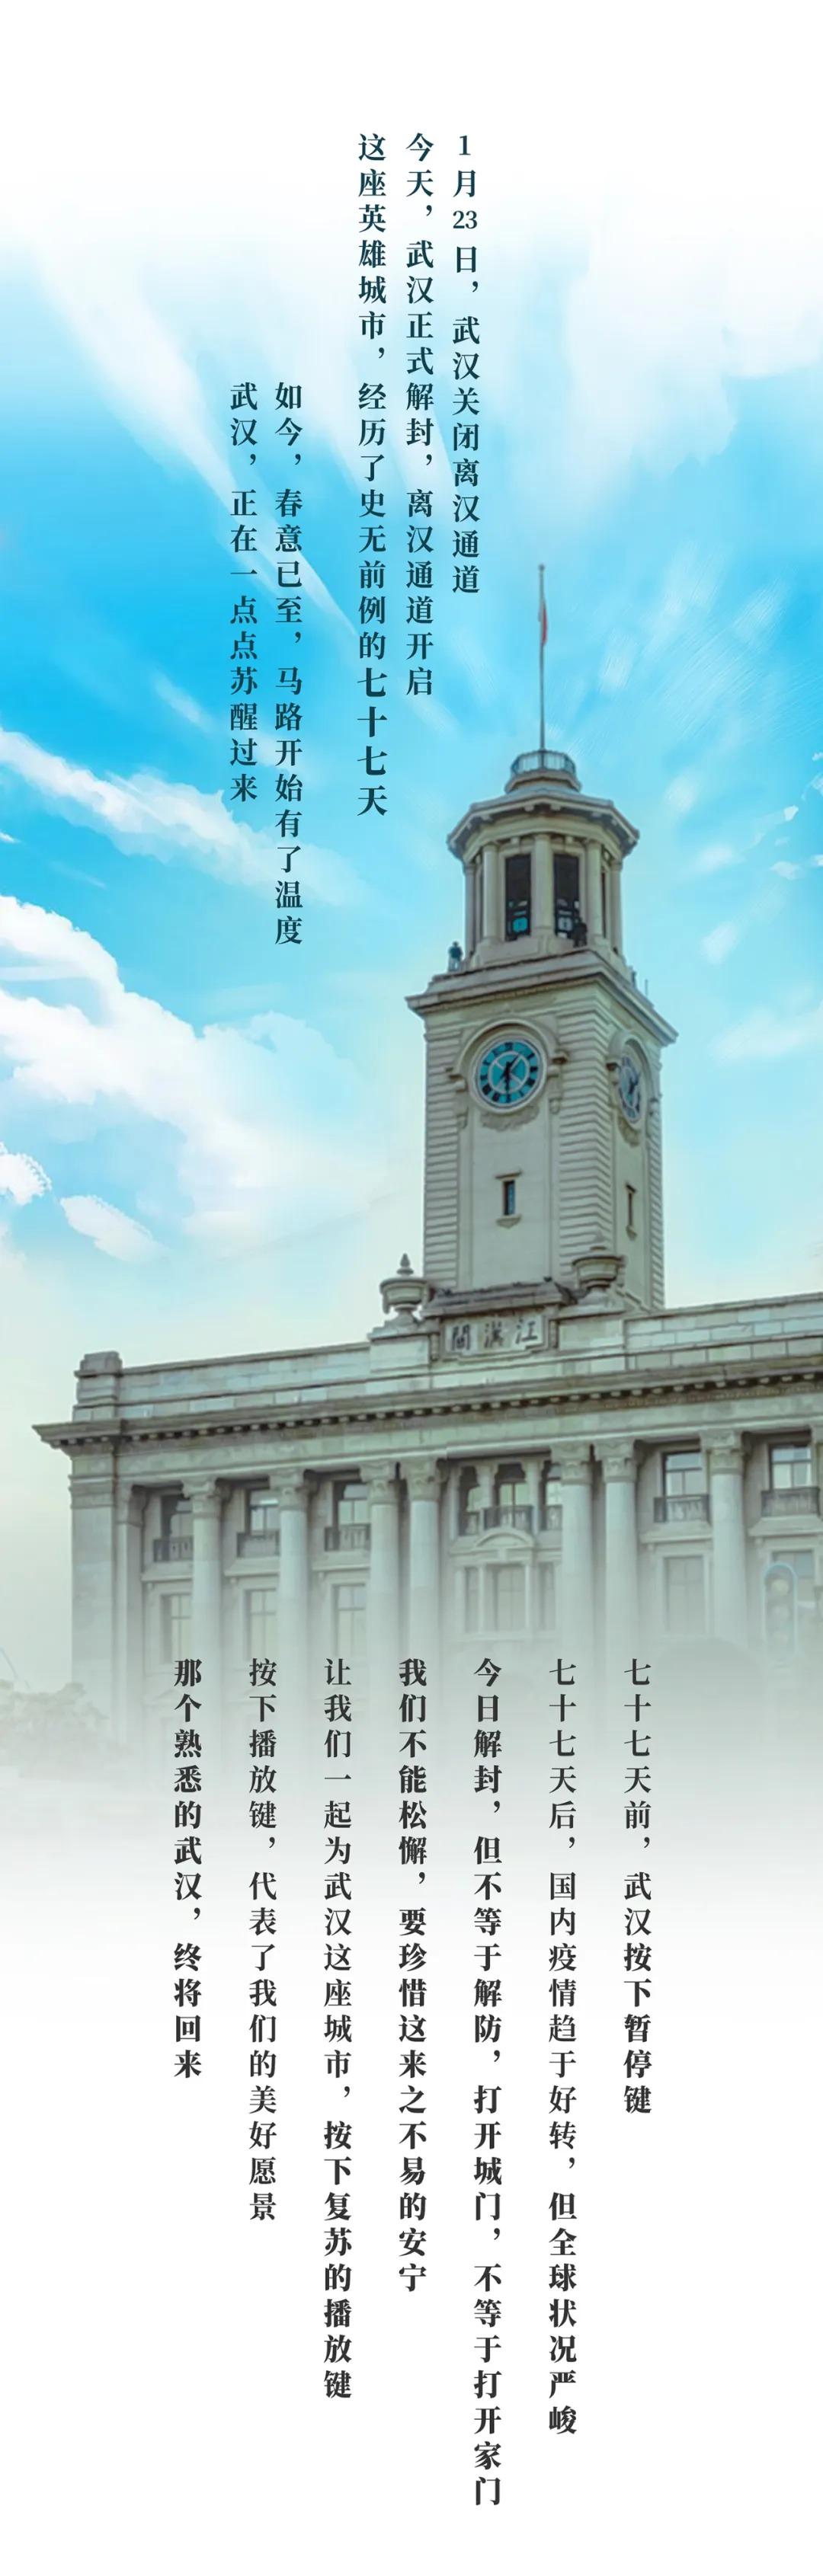 5e8df06788a68 - 武汉封城日历:76天76段现场声音,千万种悲伤与勇敢